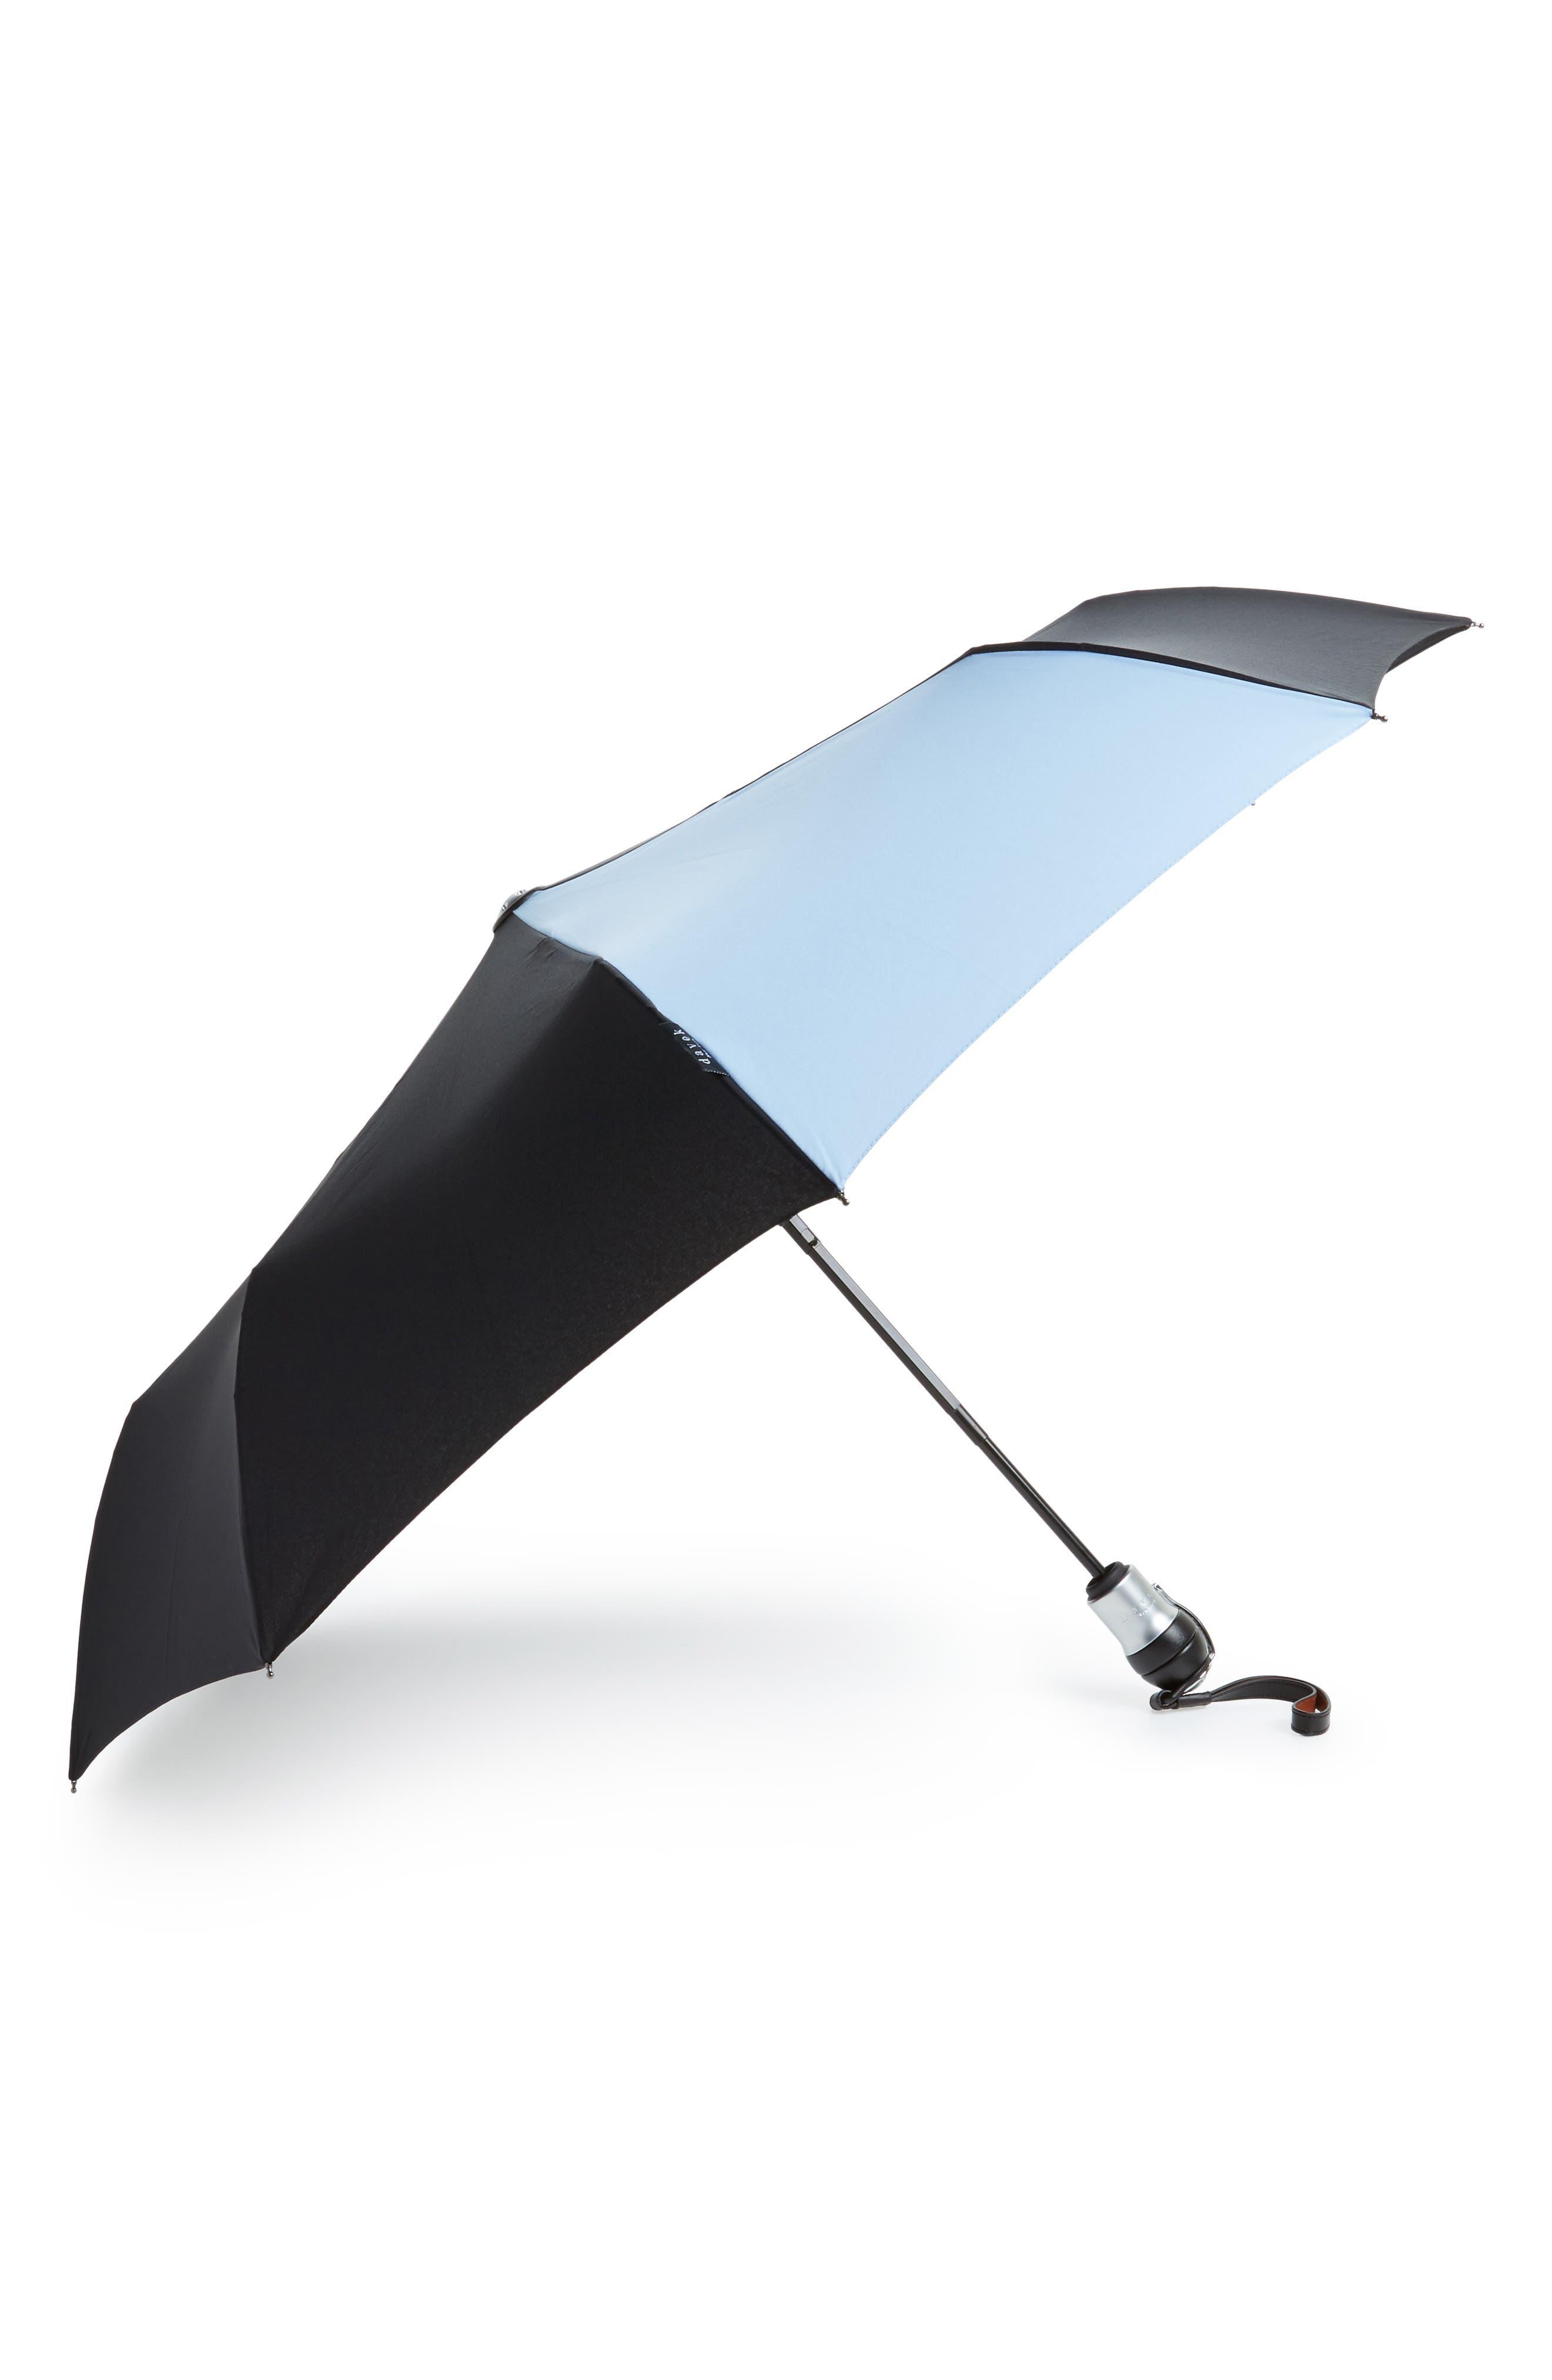 Solo Medium Umbrella,                             Main thumbnail 1, color,                             Black/ Pale Blue